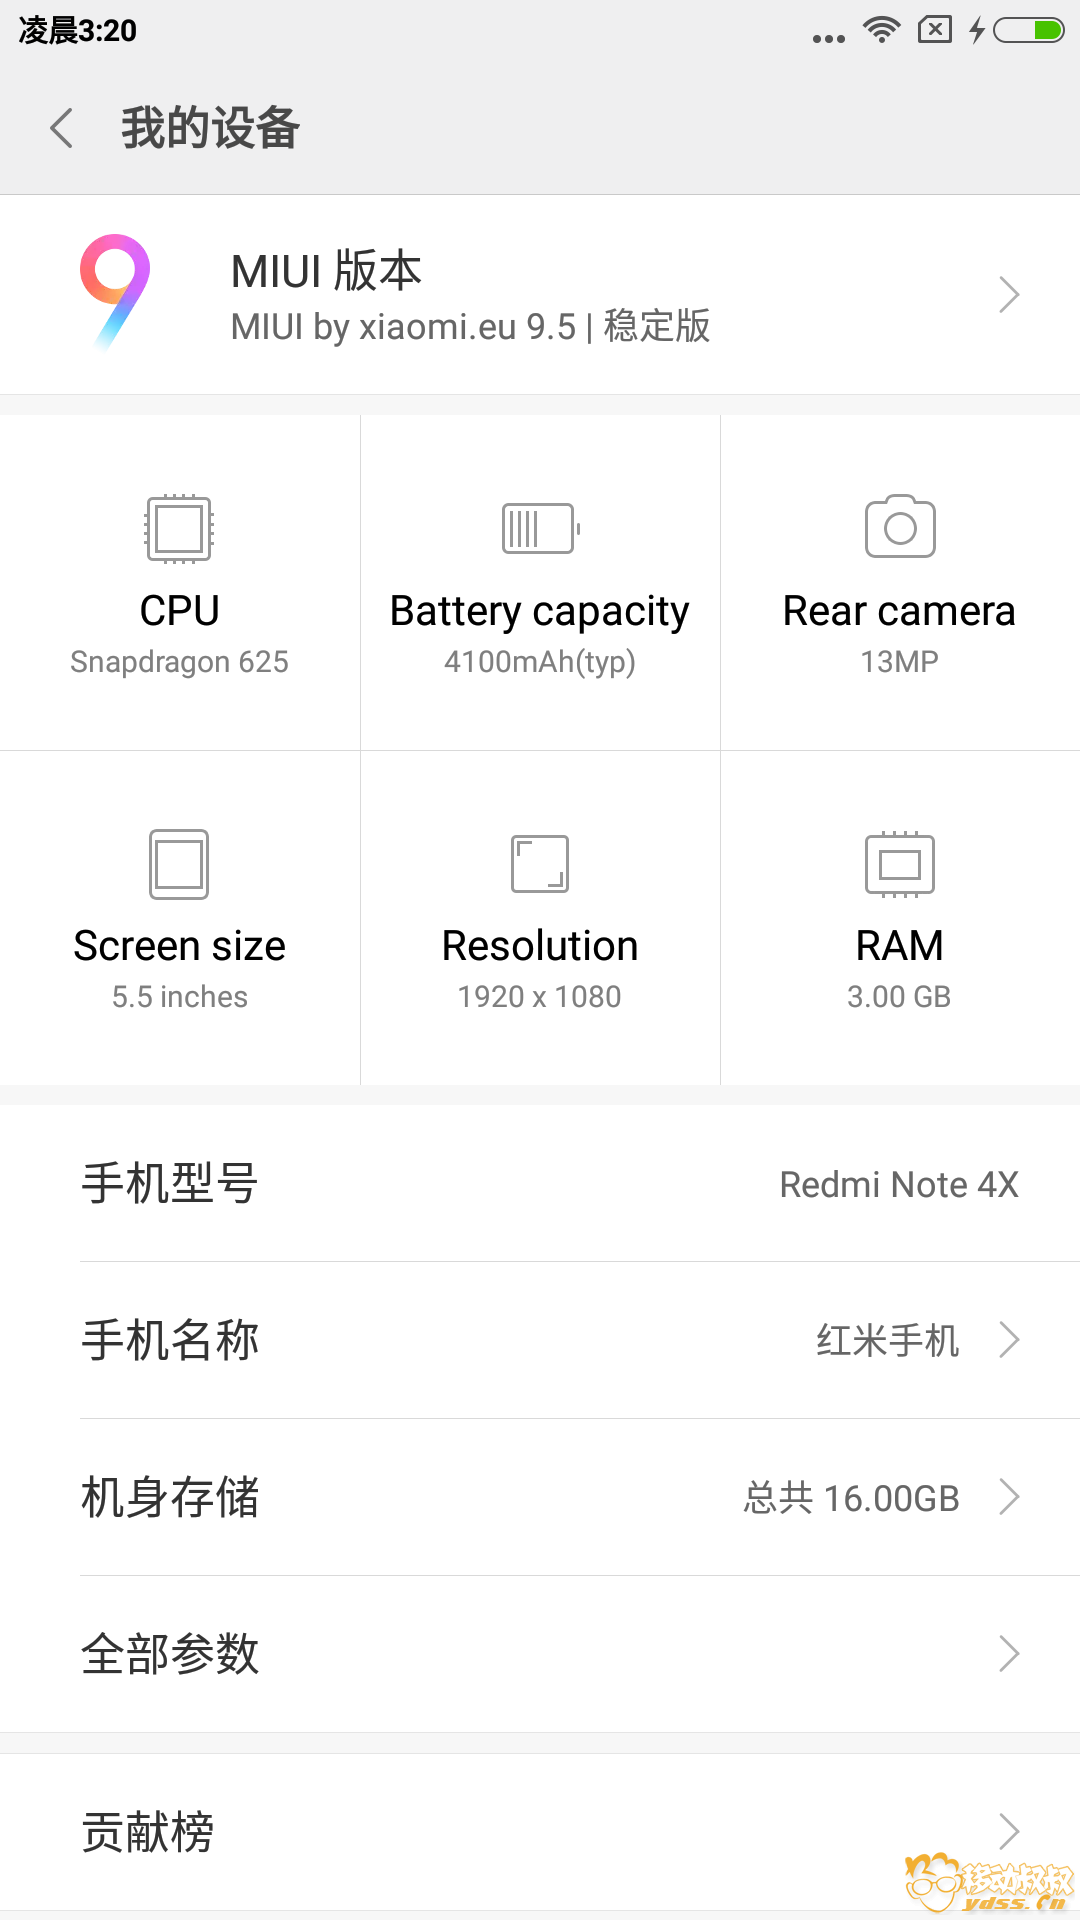 Screenshot_2018-03-13-03-20-42-098_com.android.settings.png